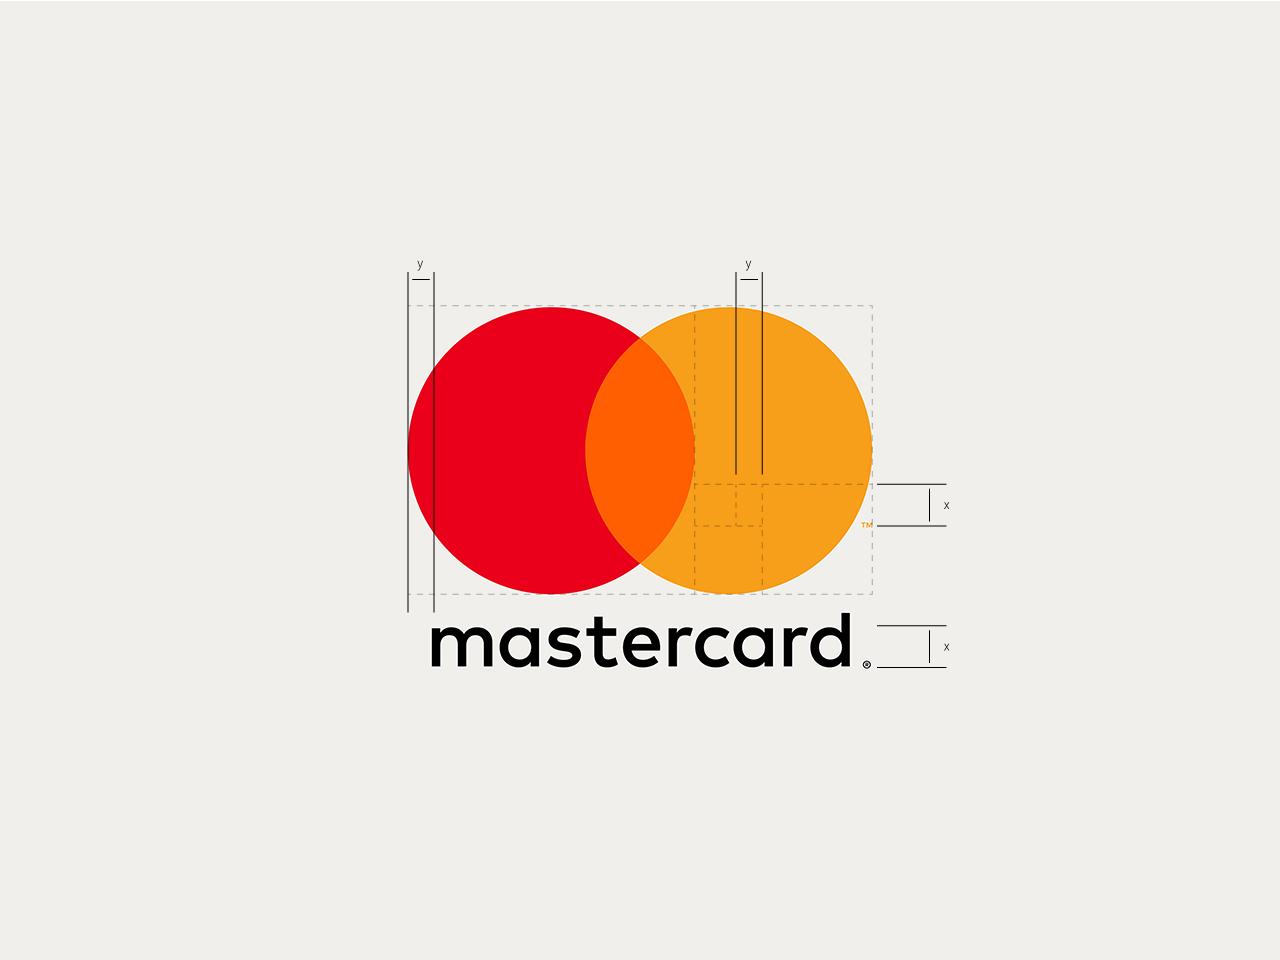 Редизайн Mastercard  Mastercard logo, Logo redesign, Mastercard